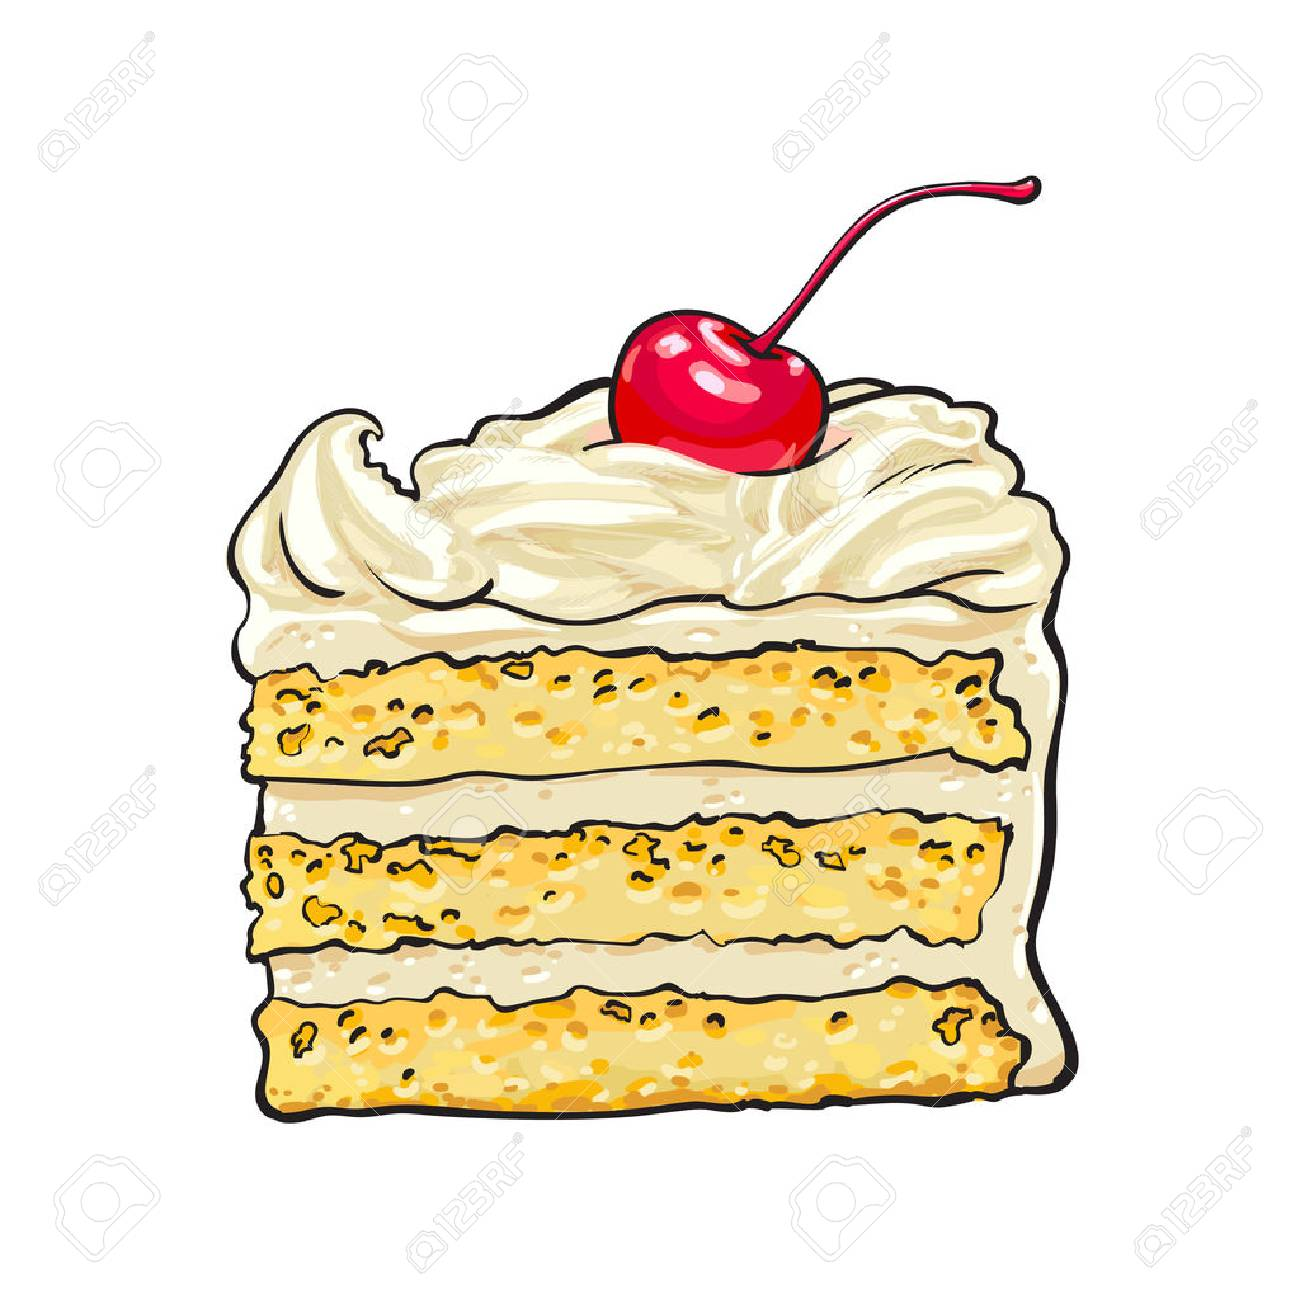 1300x1300 Hand Drawn Piece Of Classic Layered Cake With Vanilla Cream